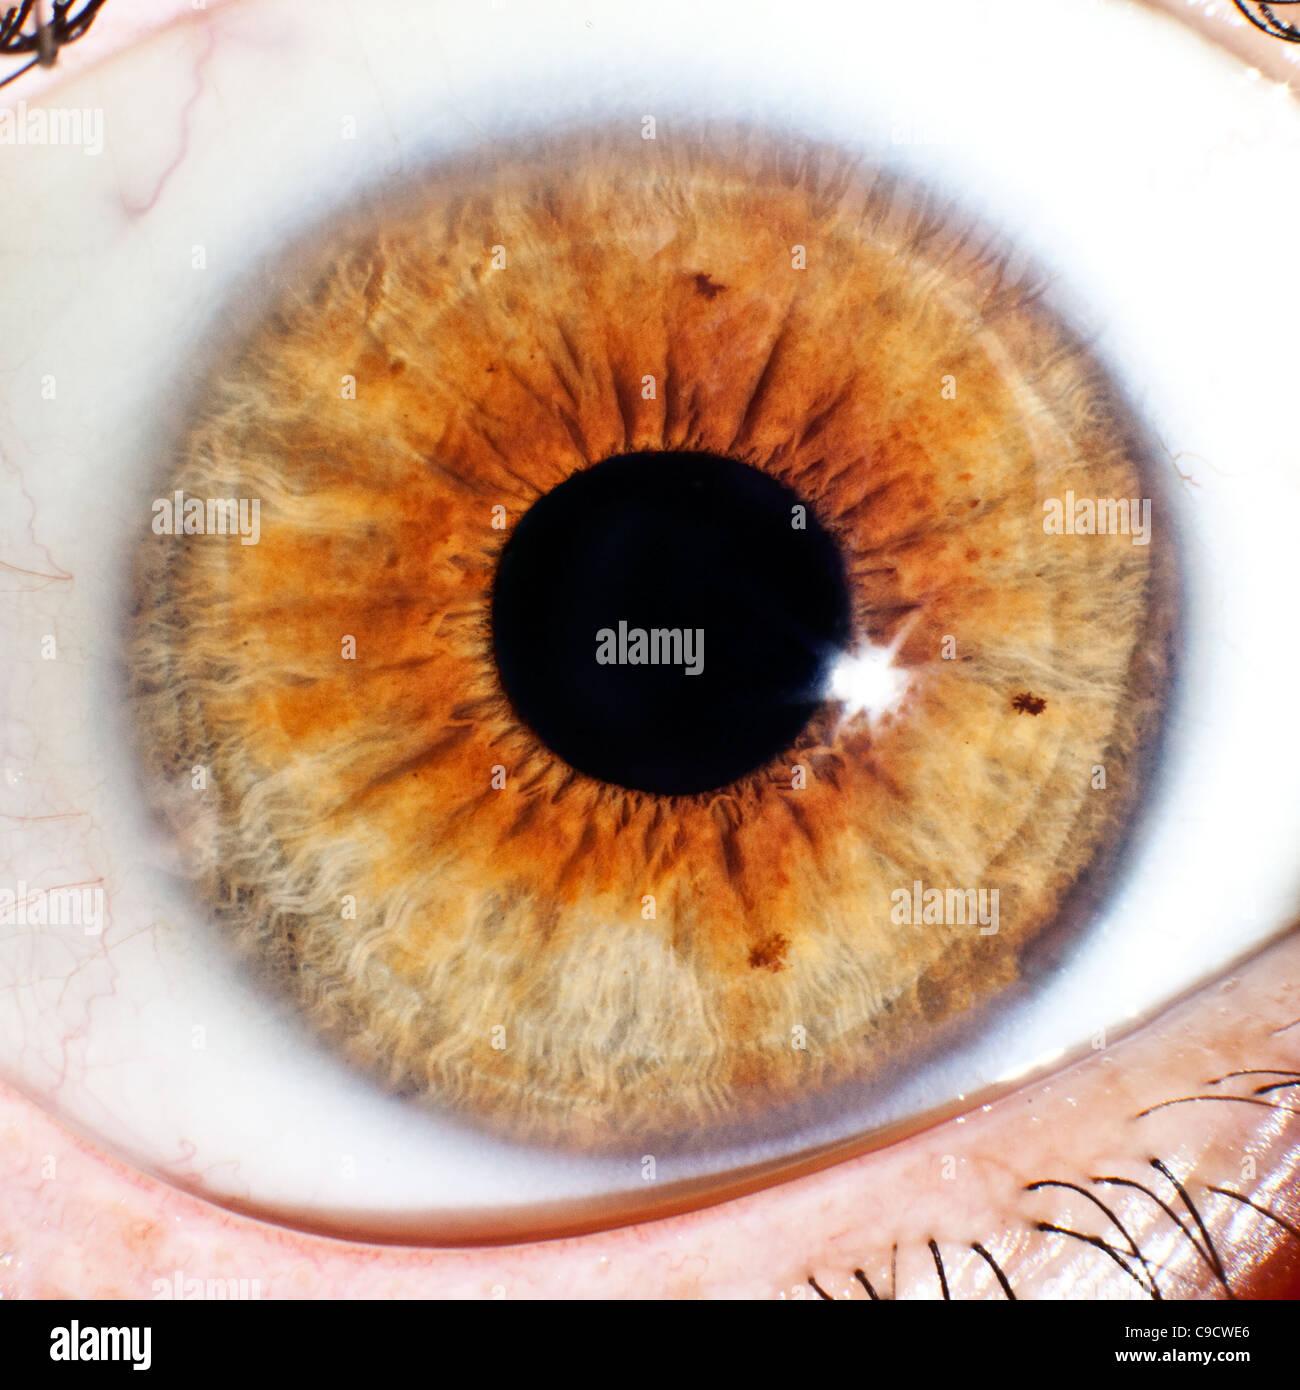 Nahaufnahme Makro von Auge Ball Iris und Pupille Stockbild